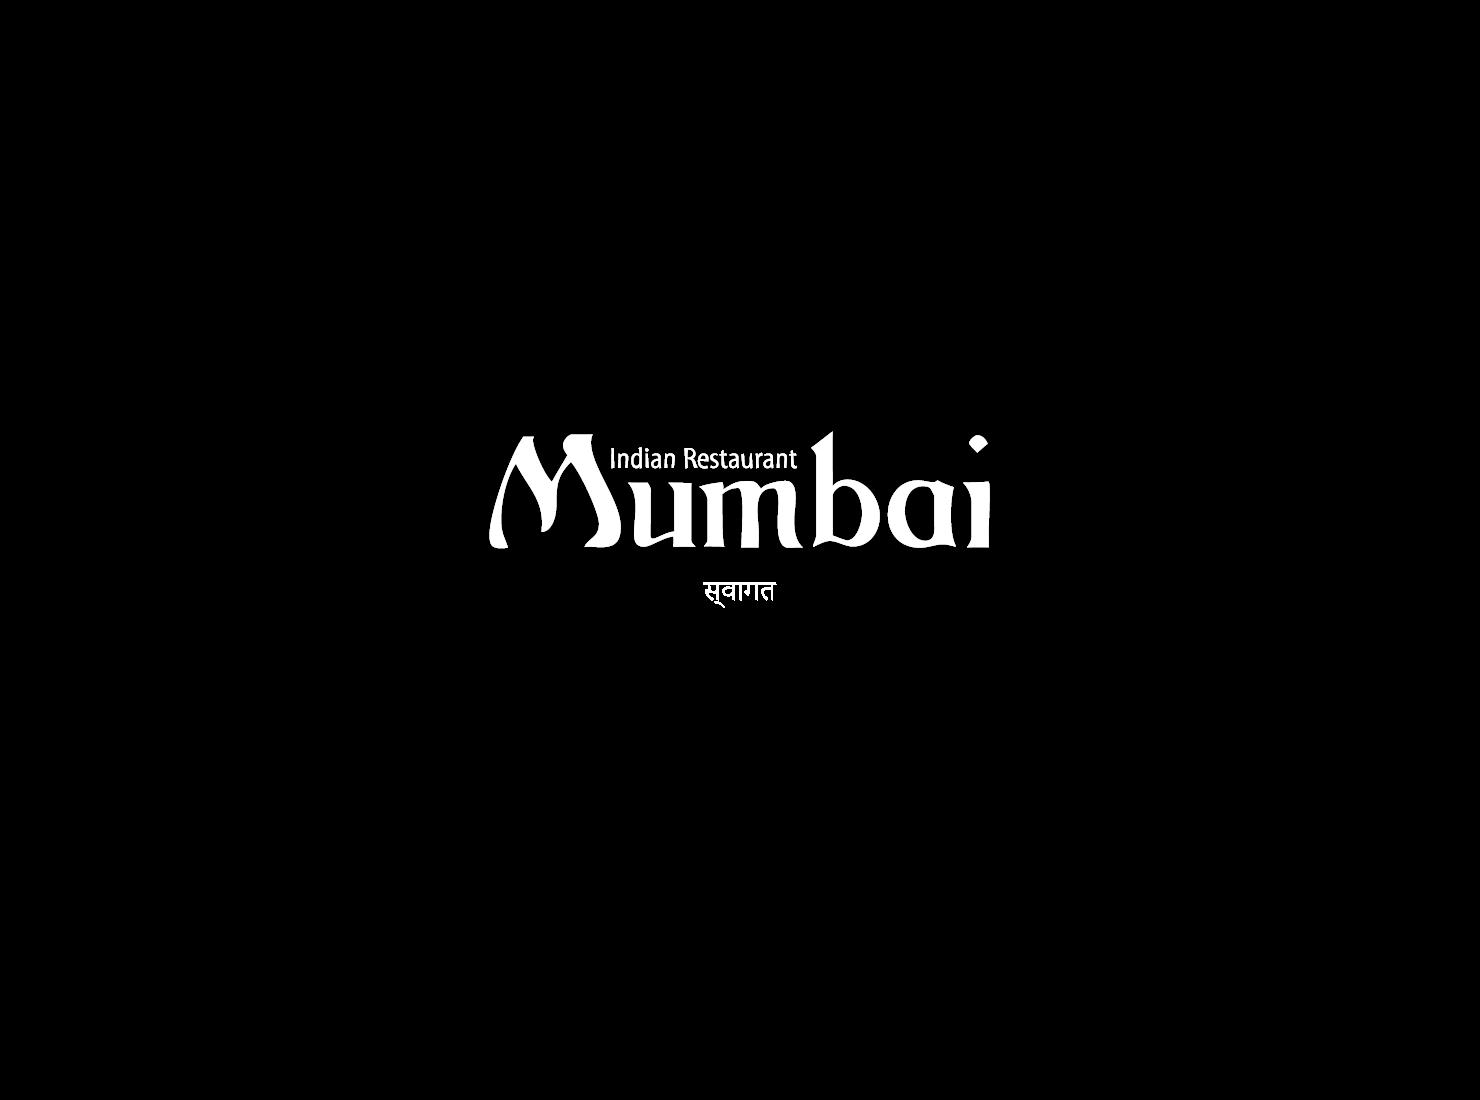 Indian Restaurant Mumbai